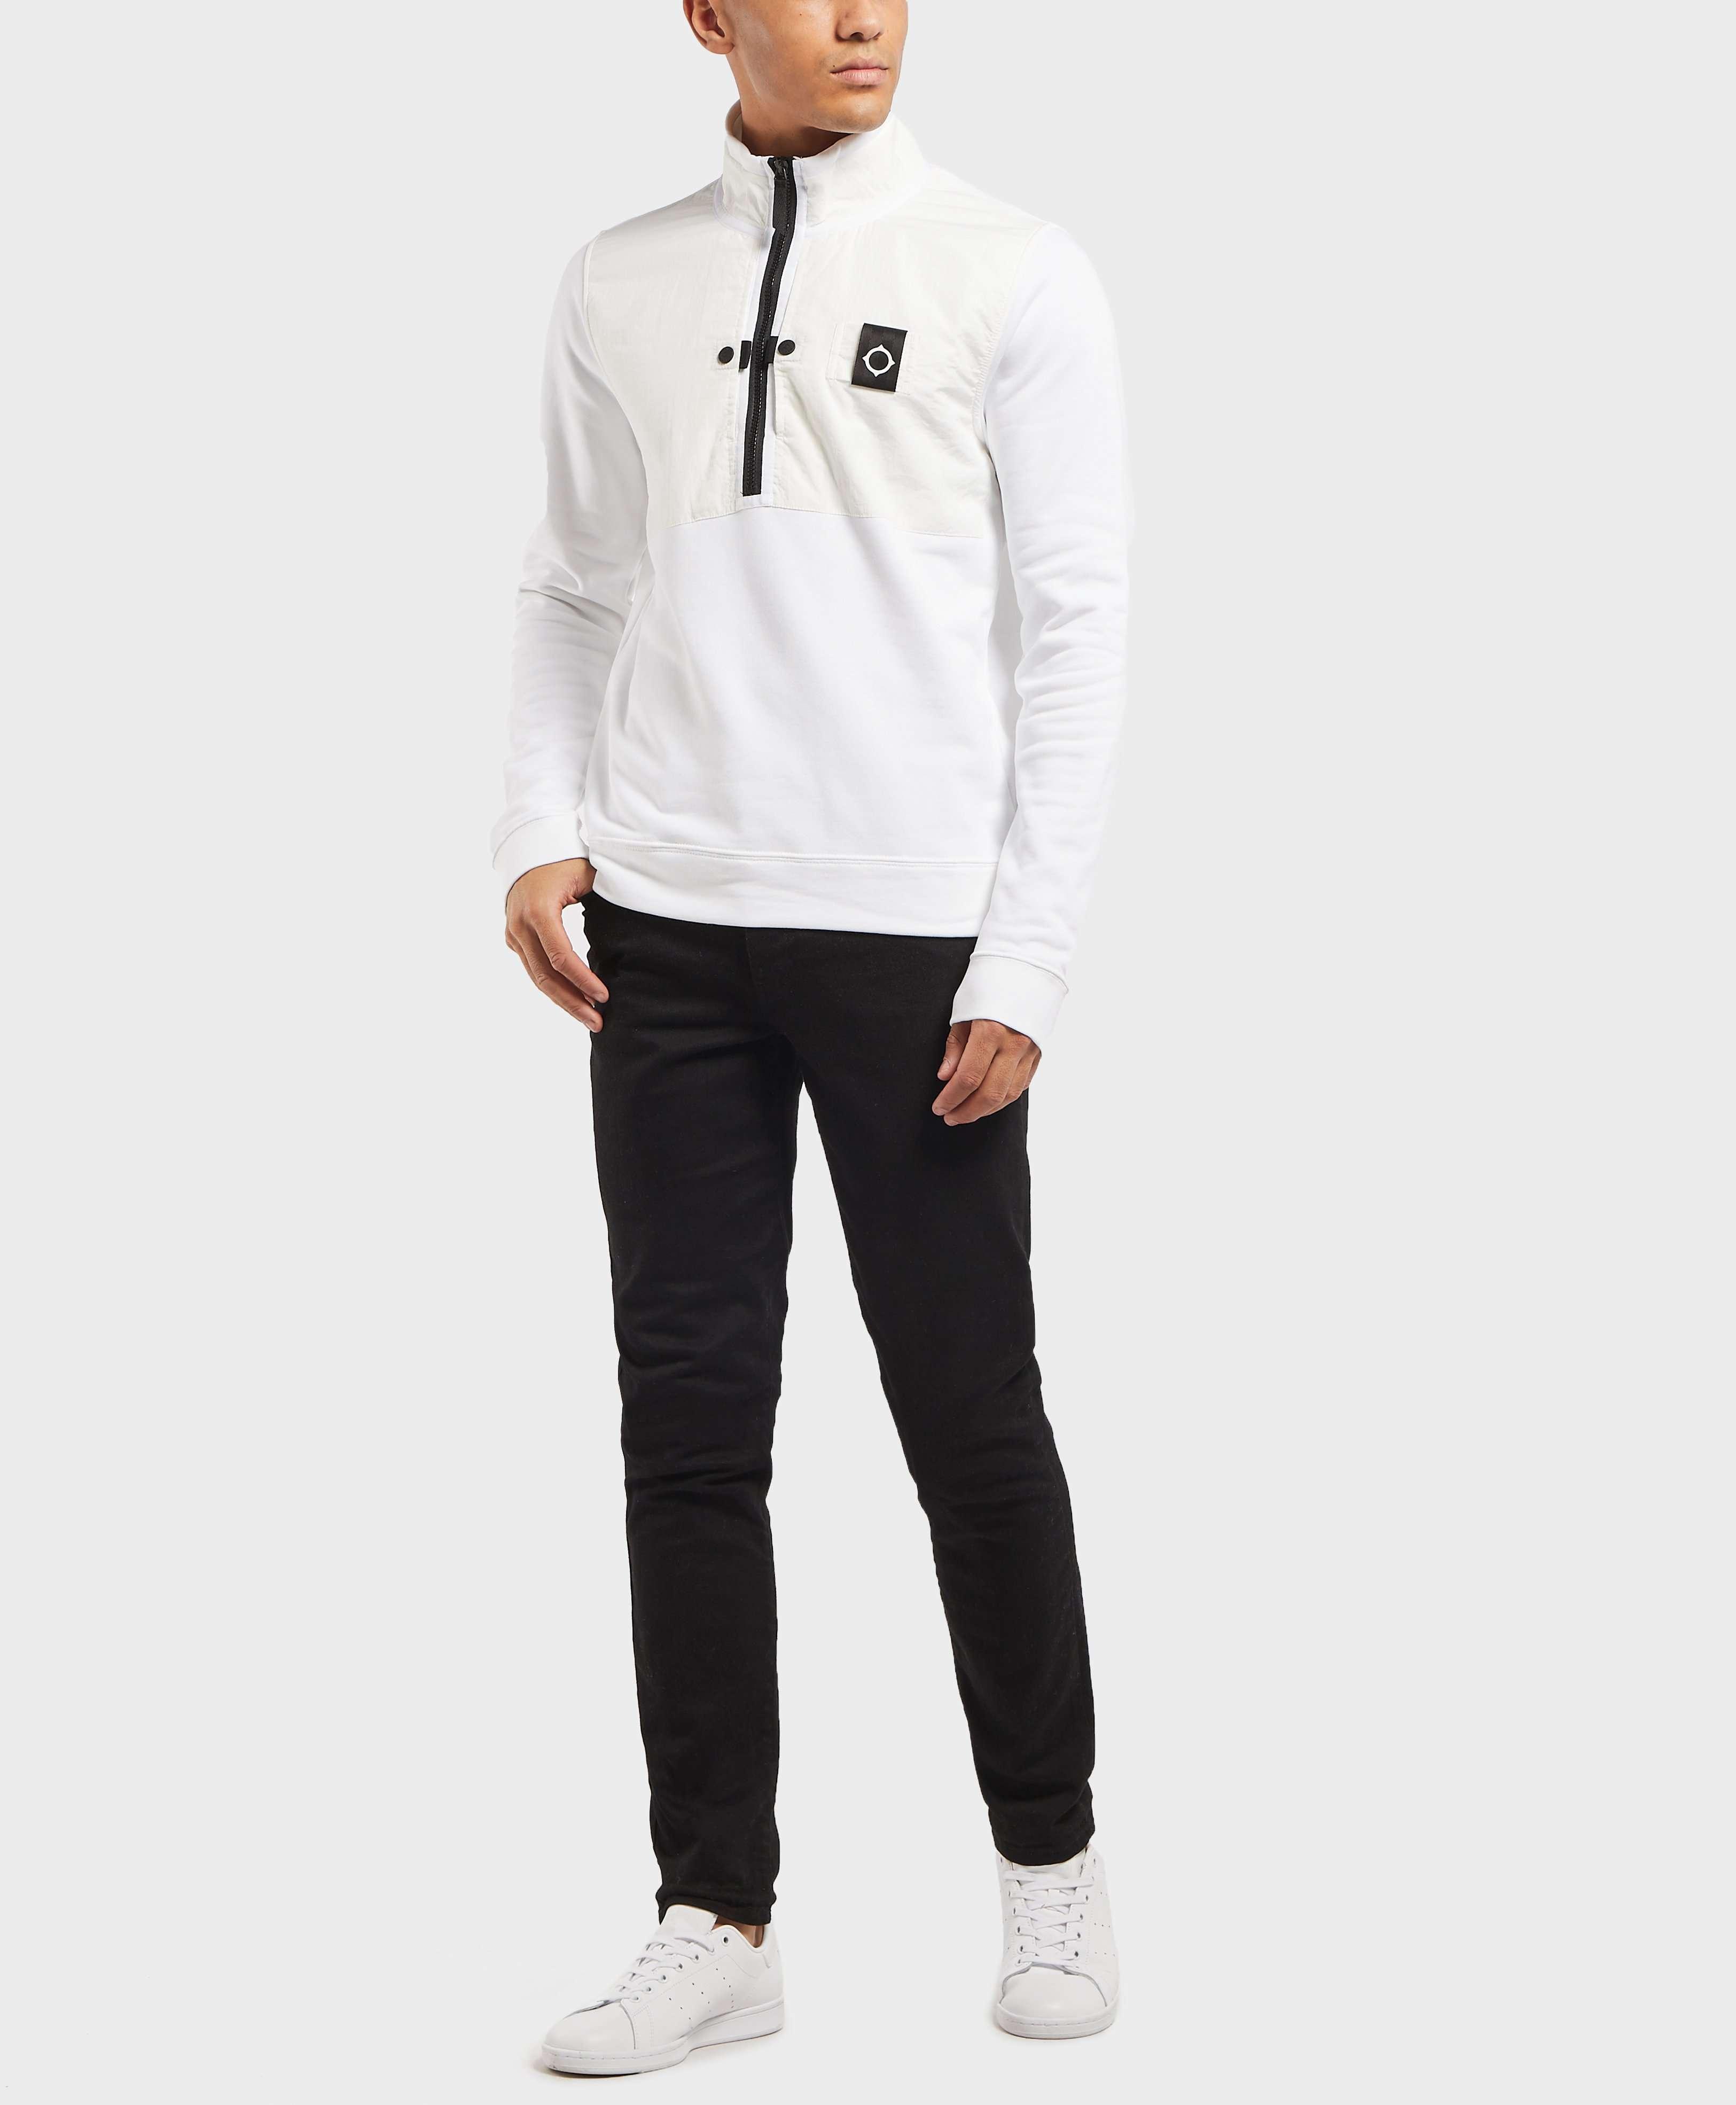 MA STRUM Training Half Zip Sweatshirt